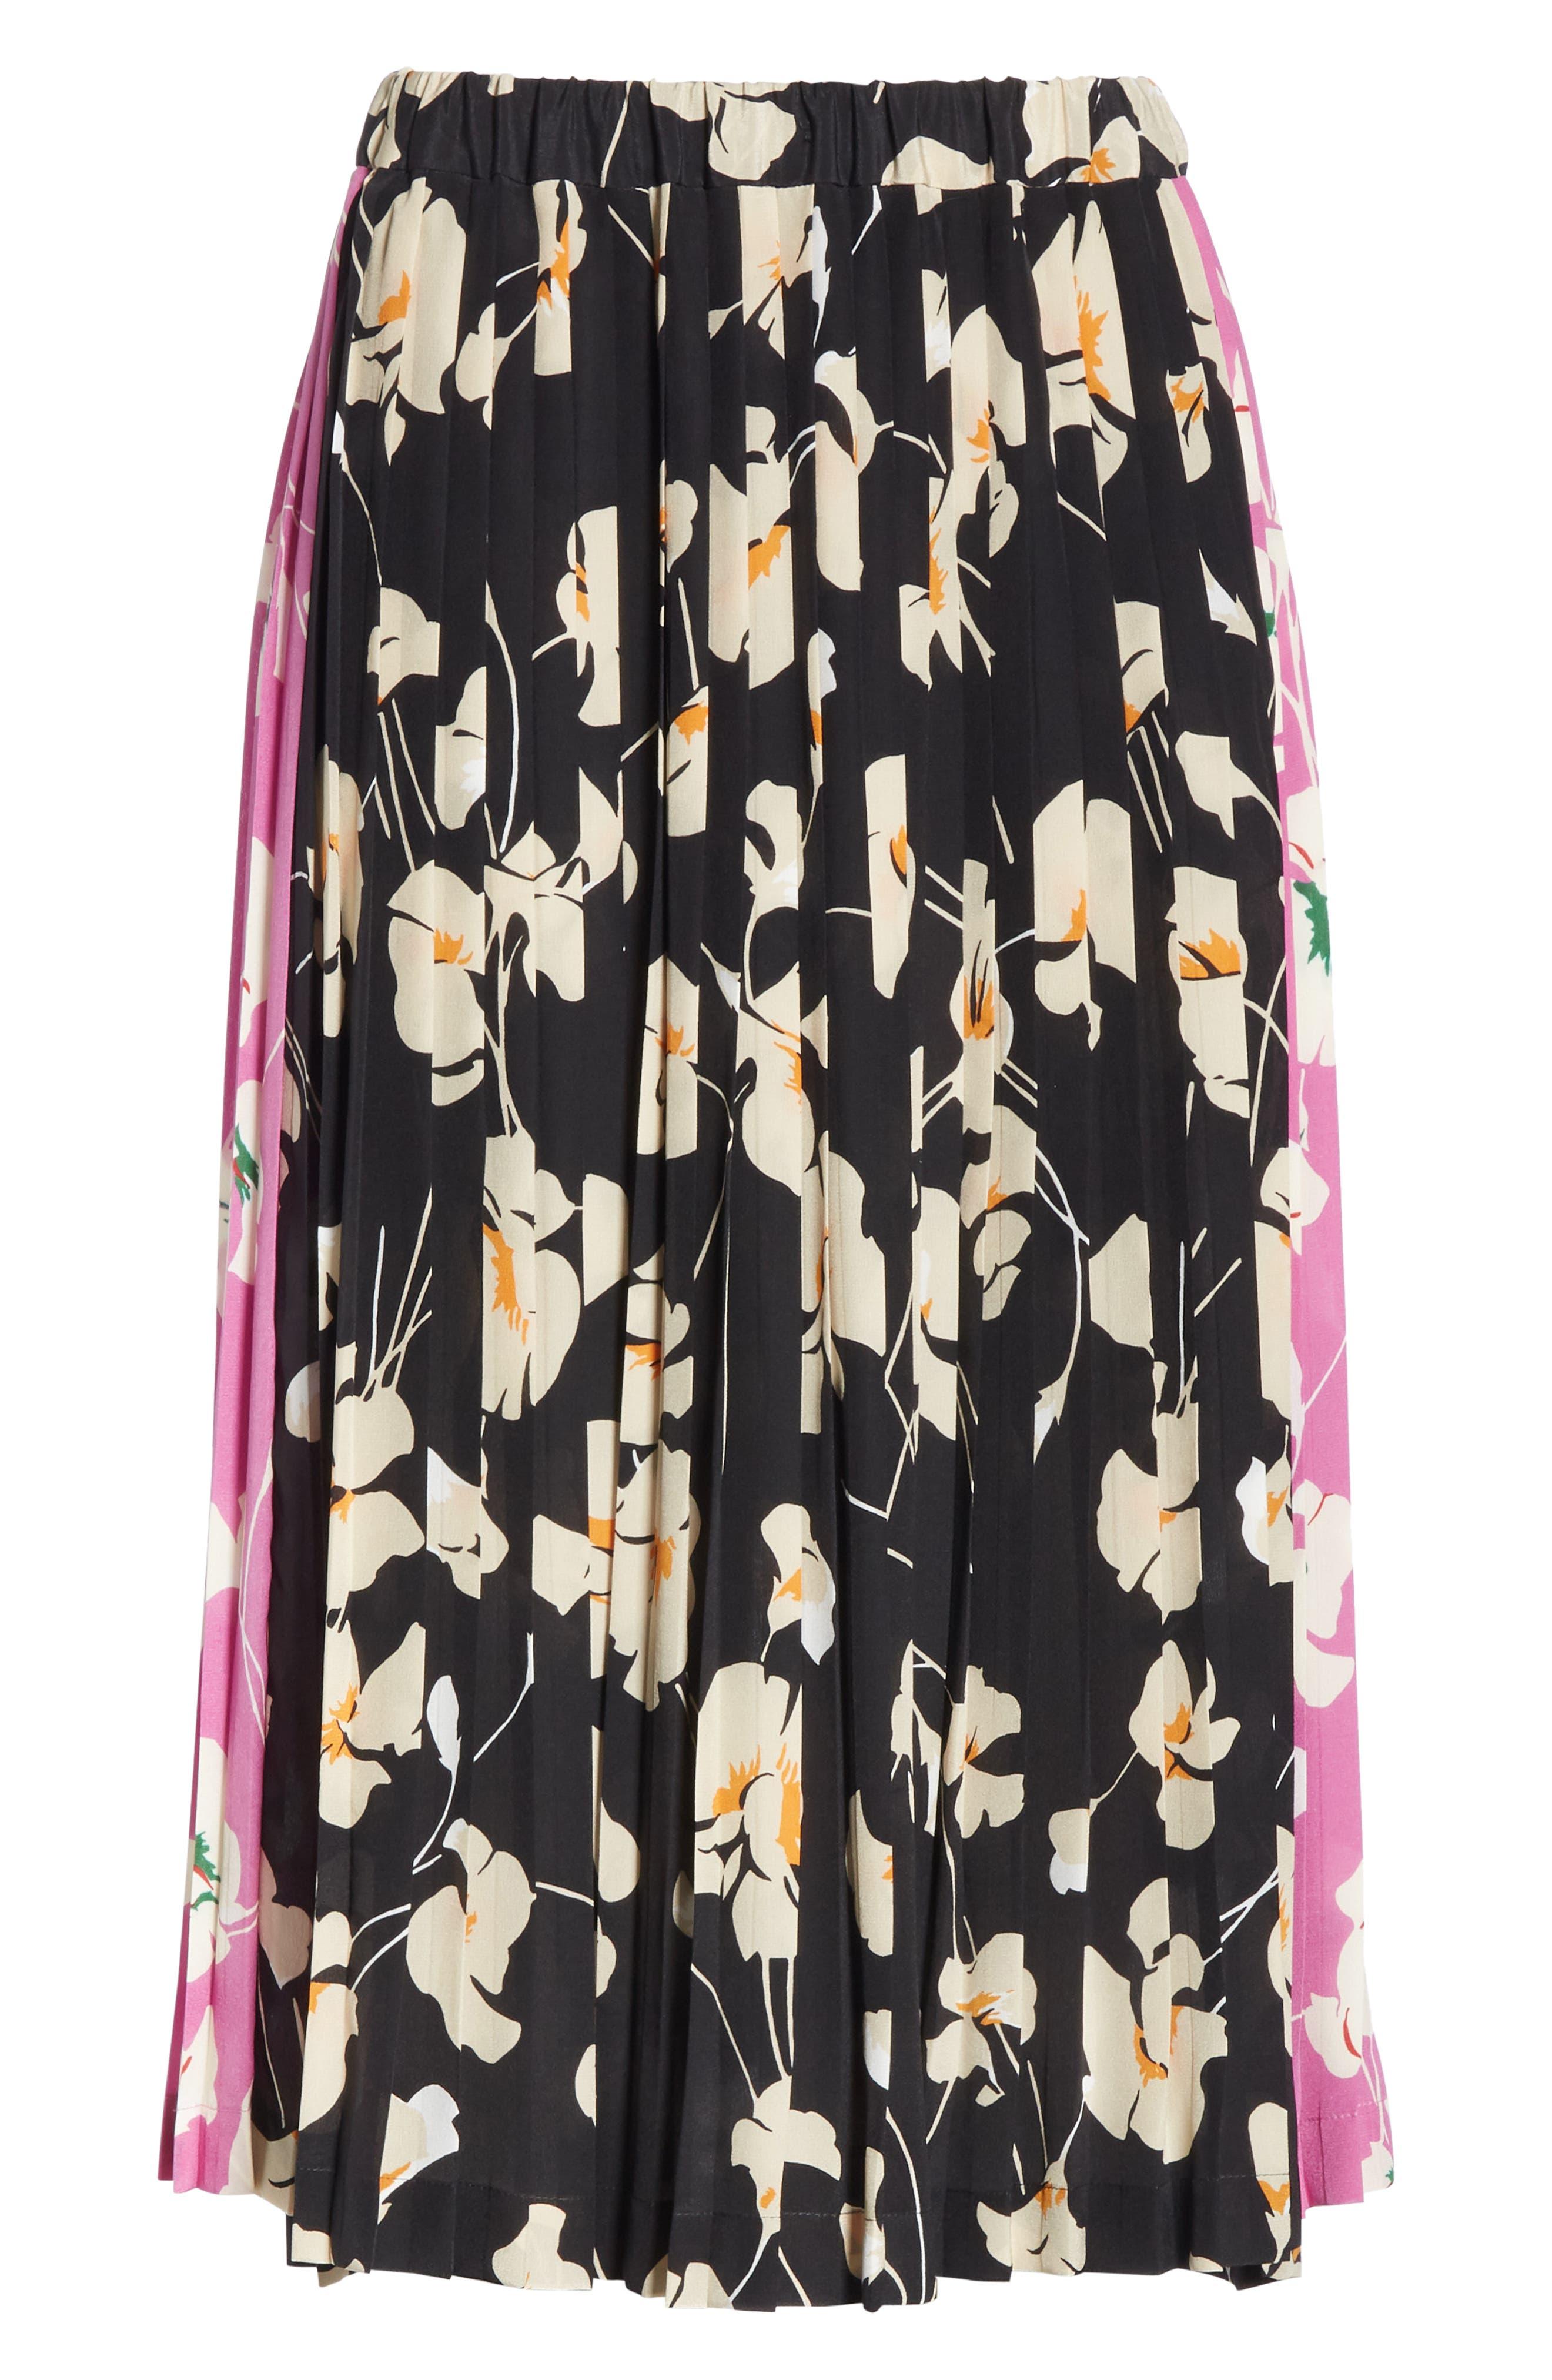 N°21,                             Nº21 Contrast Panel Floral Print Silk Skirt,                             Alternate thumbnail 6, color,                             STAMPA FONDO NERO